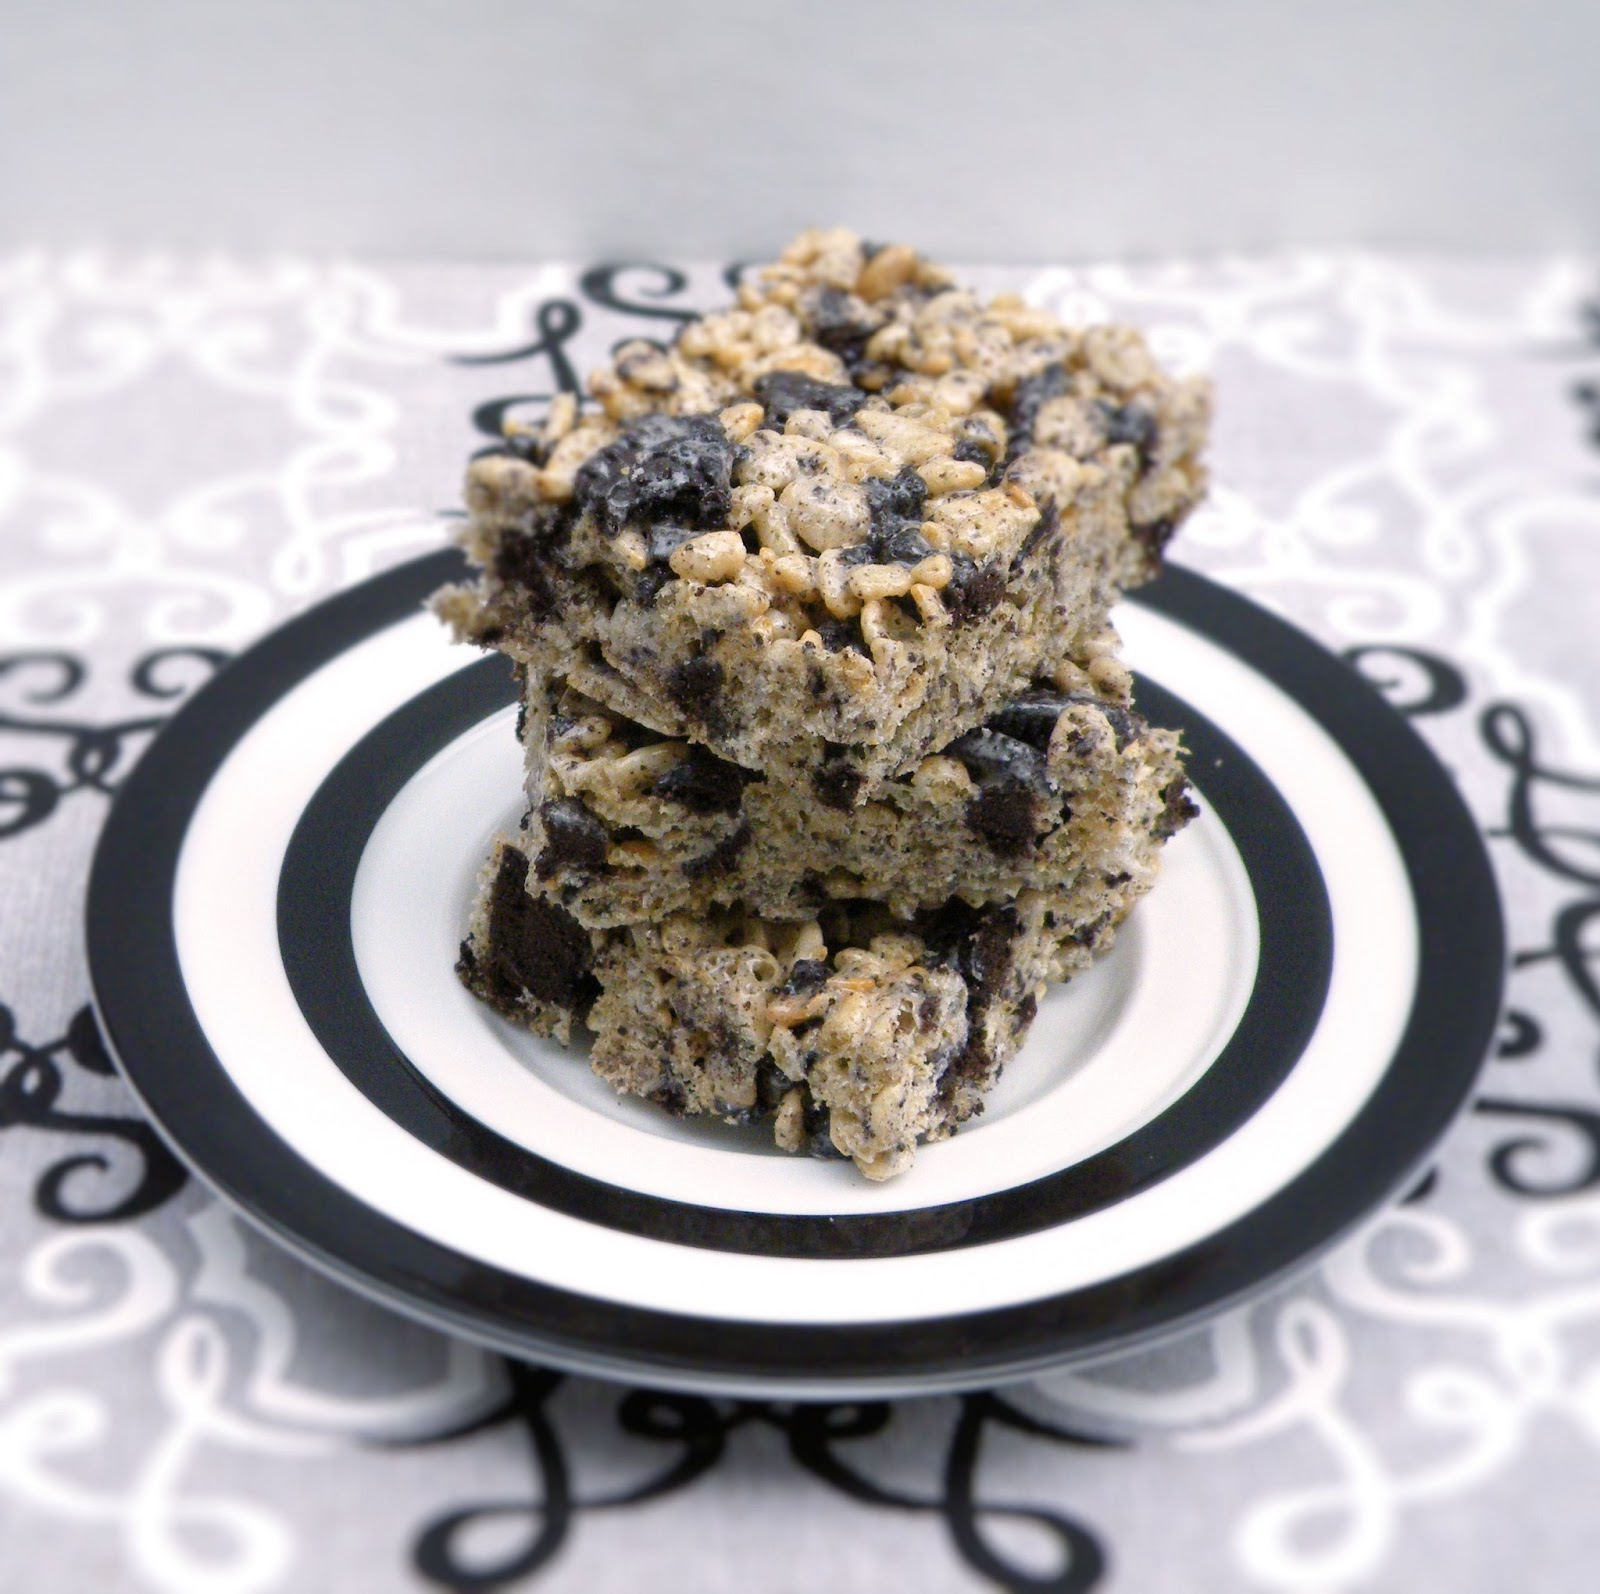 Vittles and Bits: Cookies & Cream Marshmallow Crispy Treats